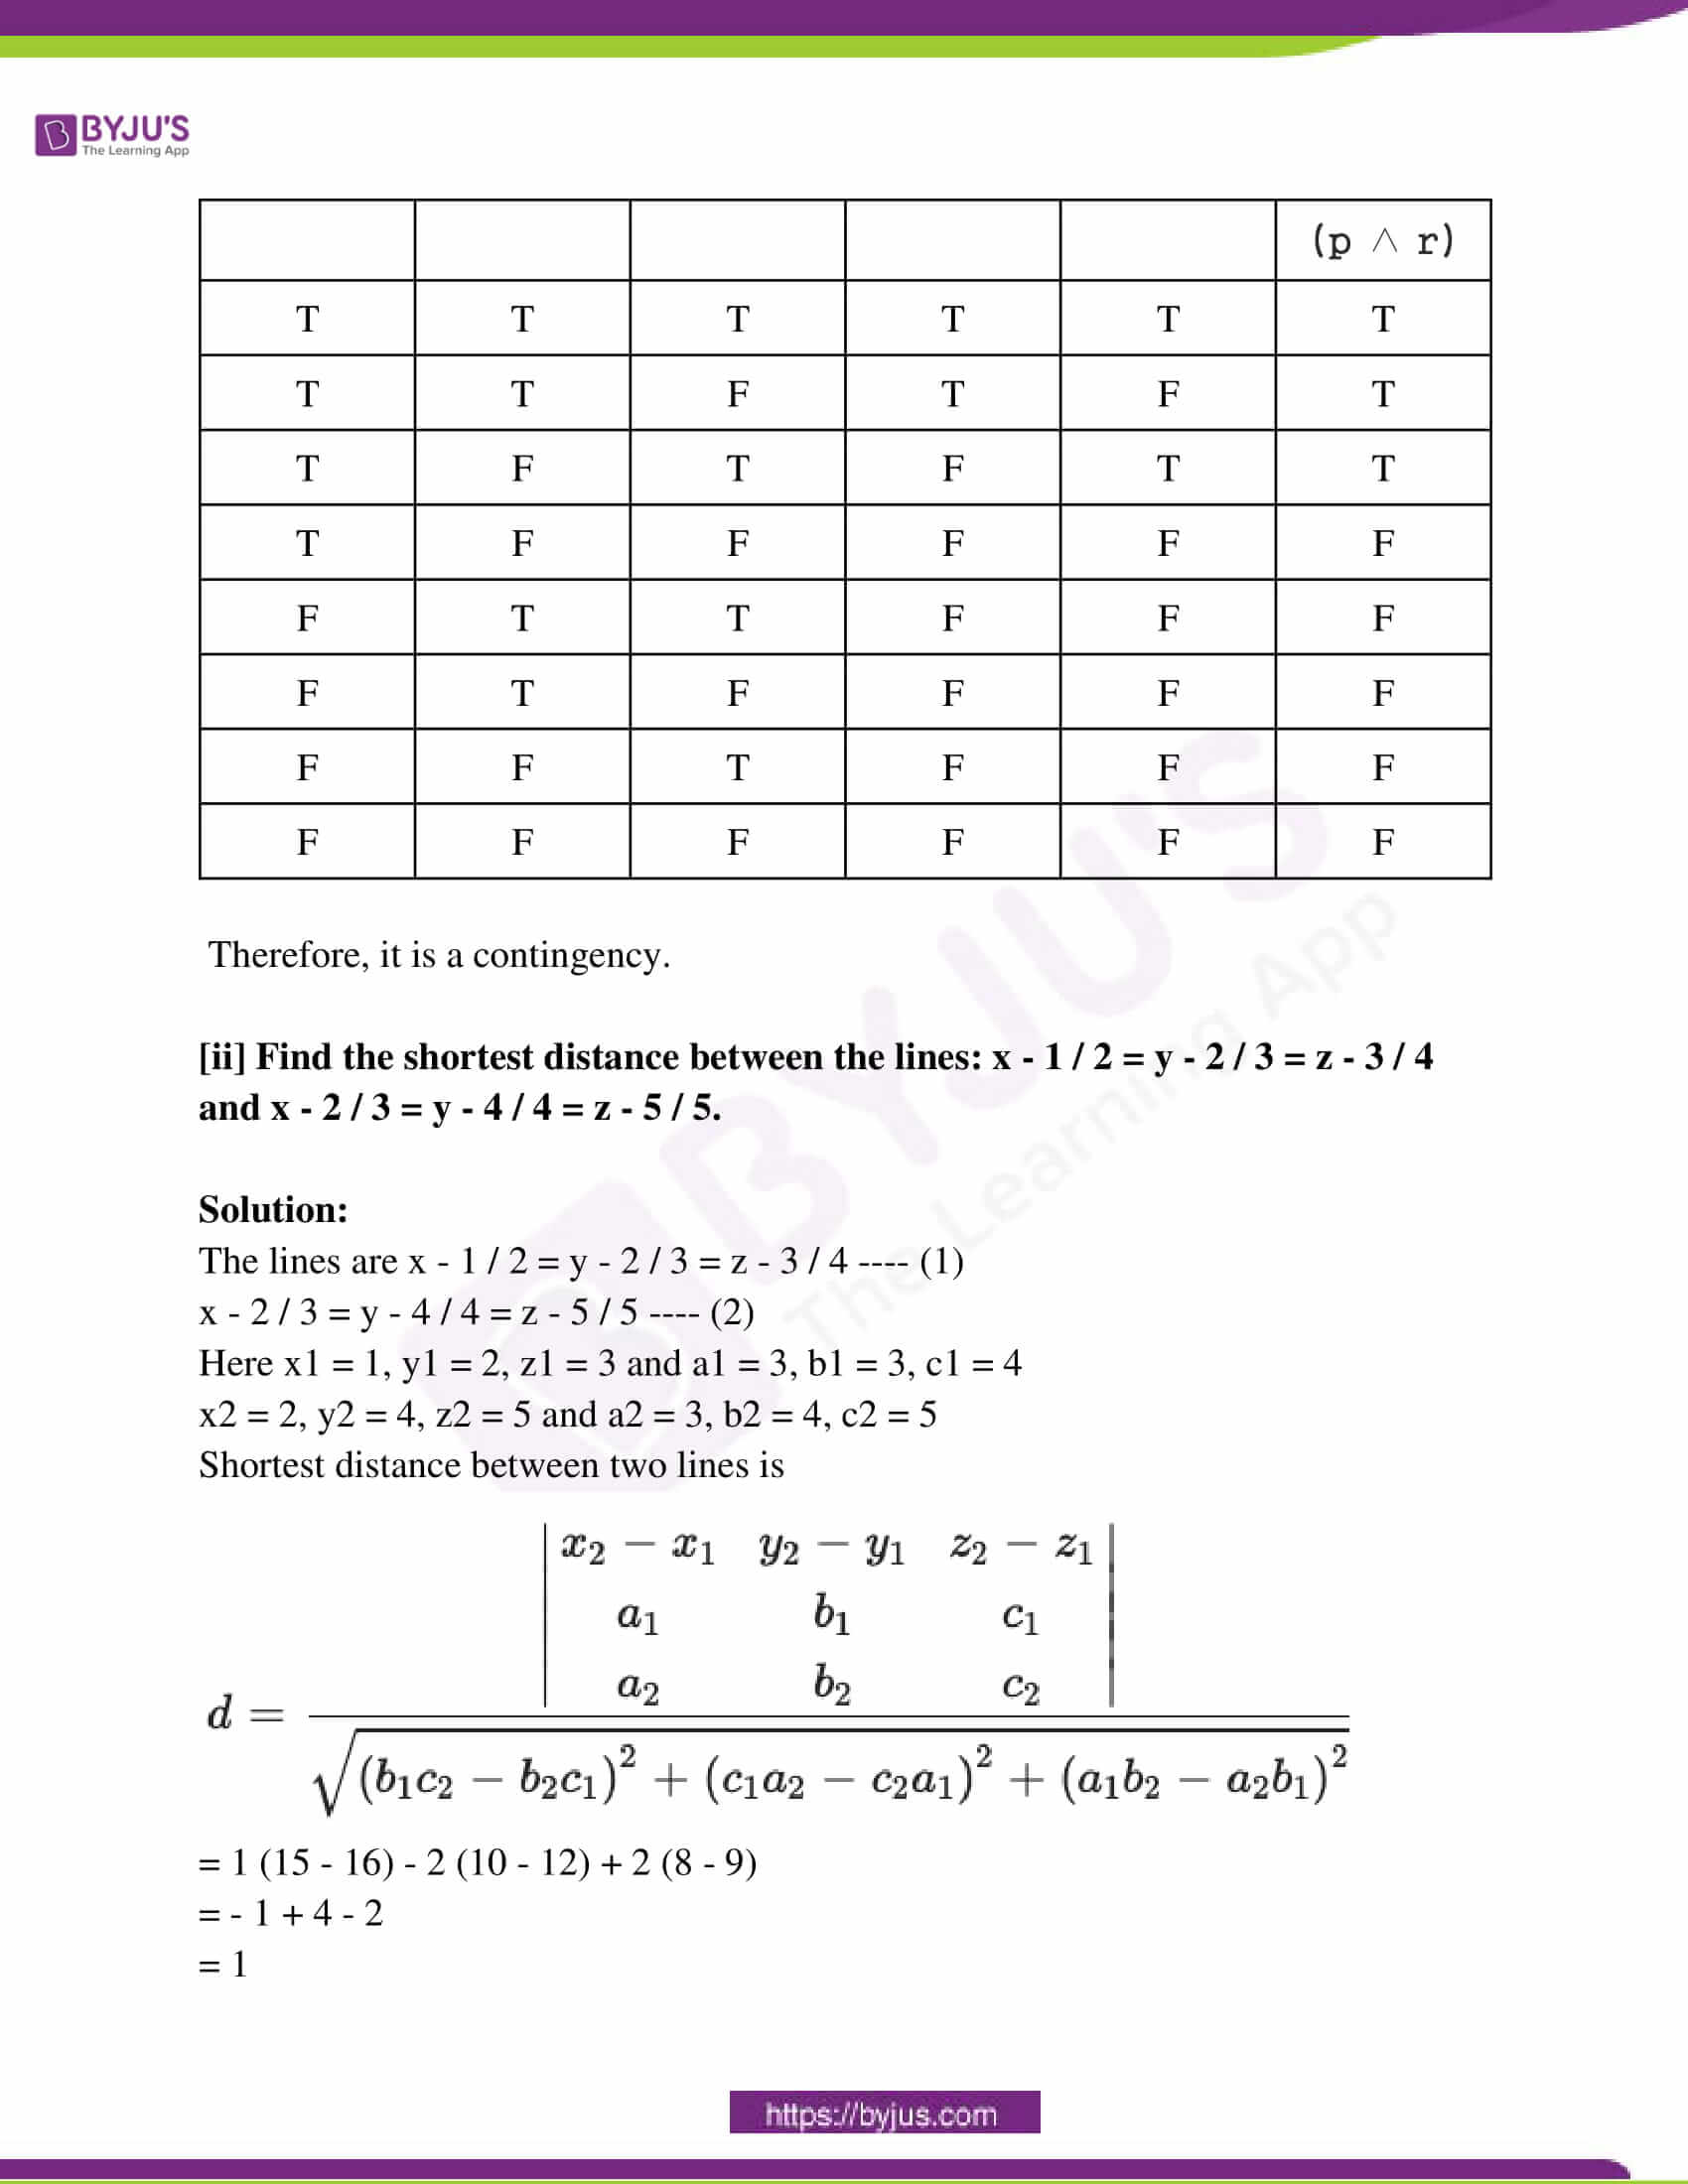 maharashtra class 12 exam question paper solutions march 2017 07